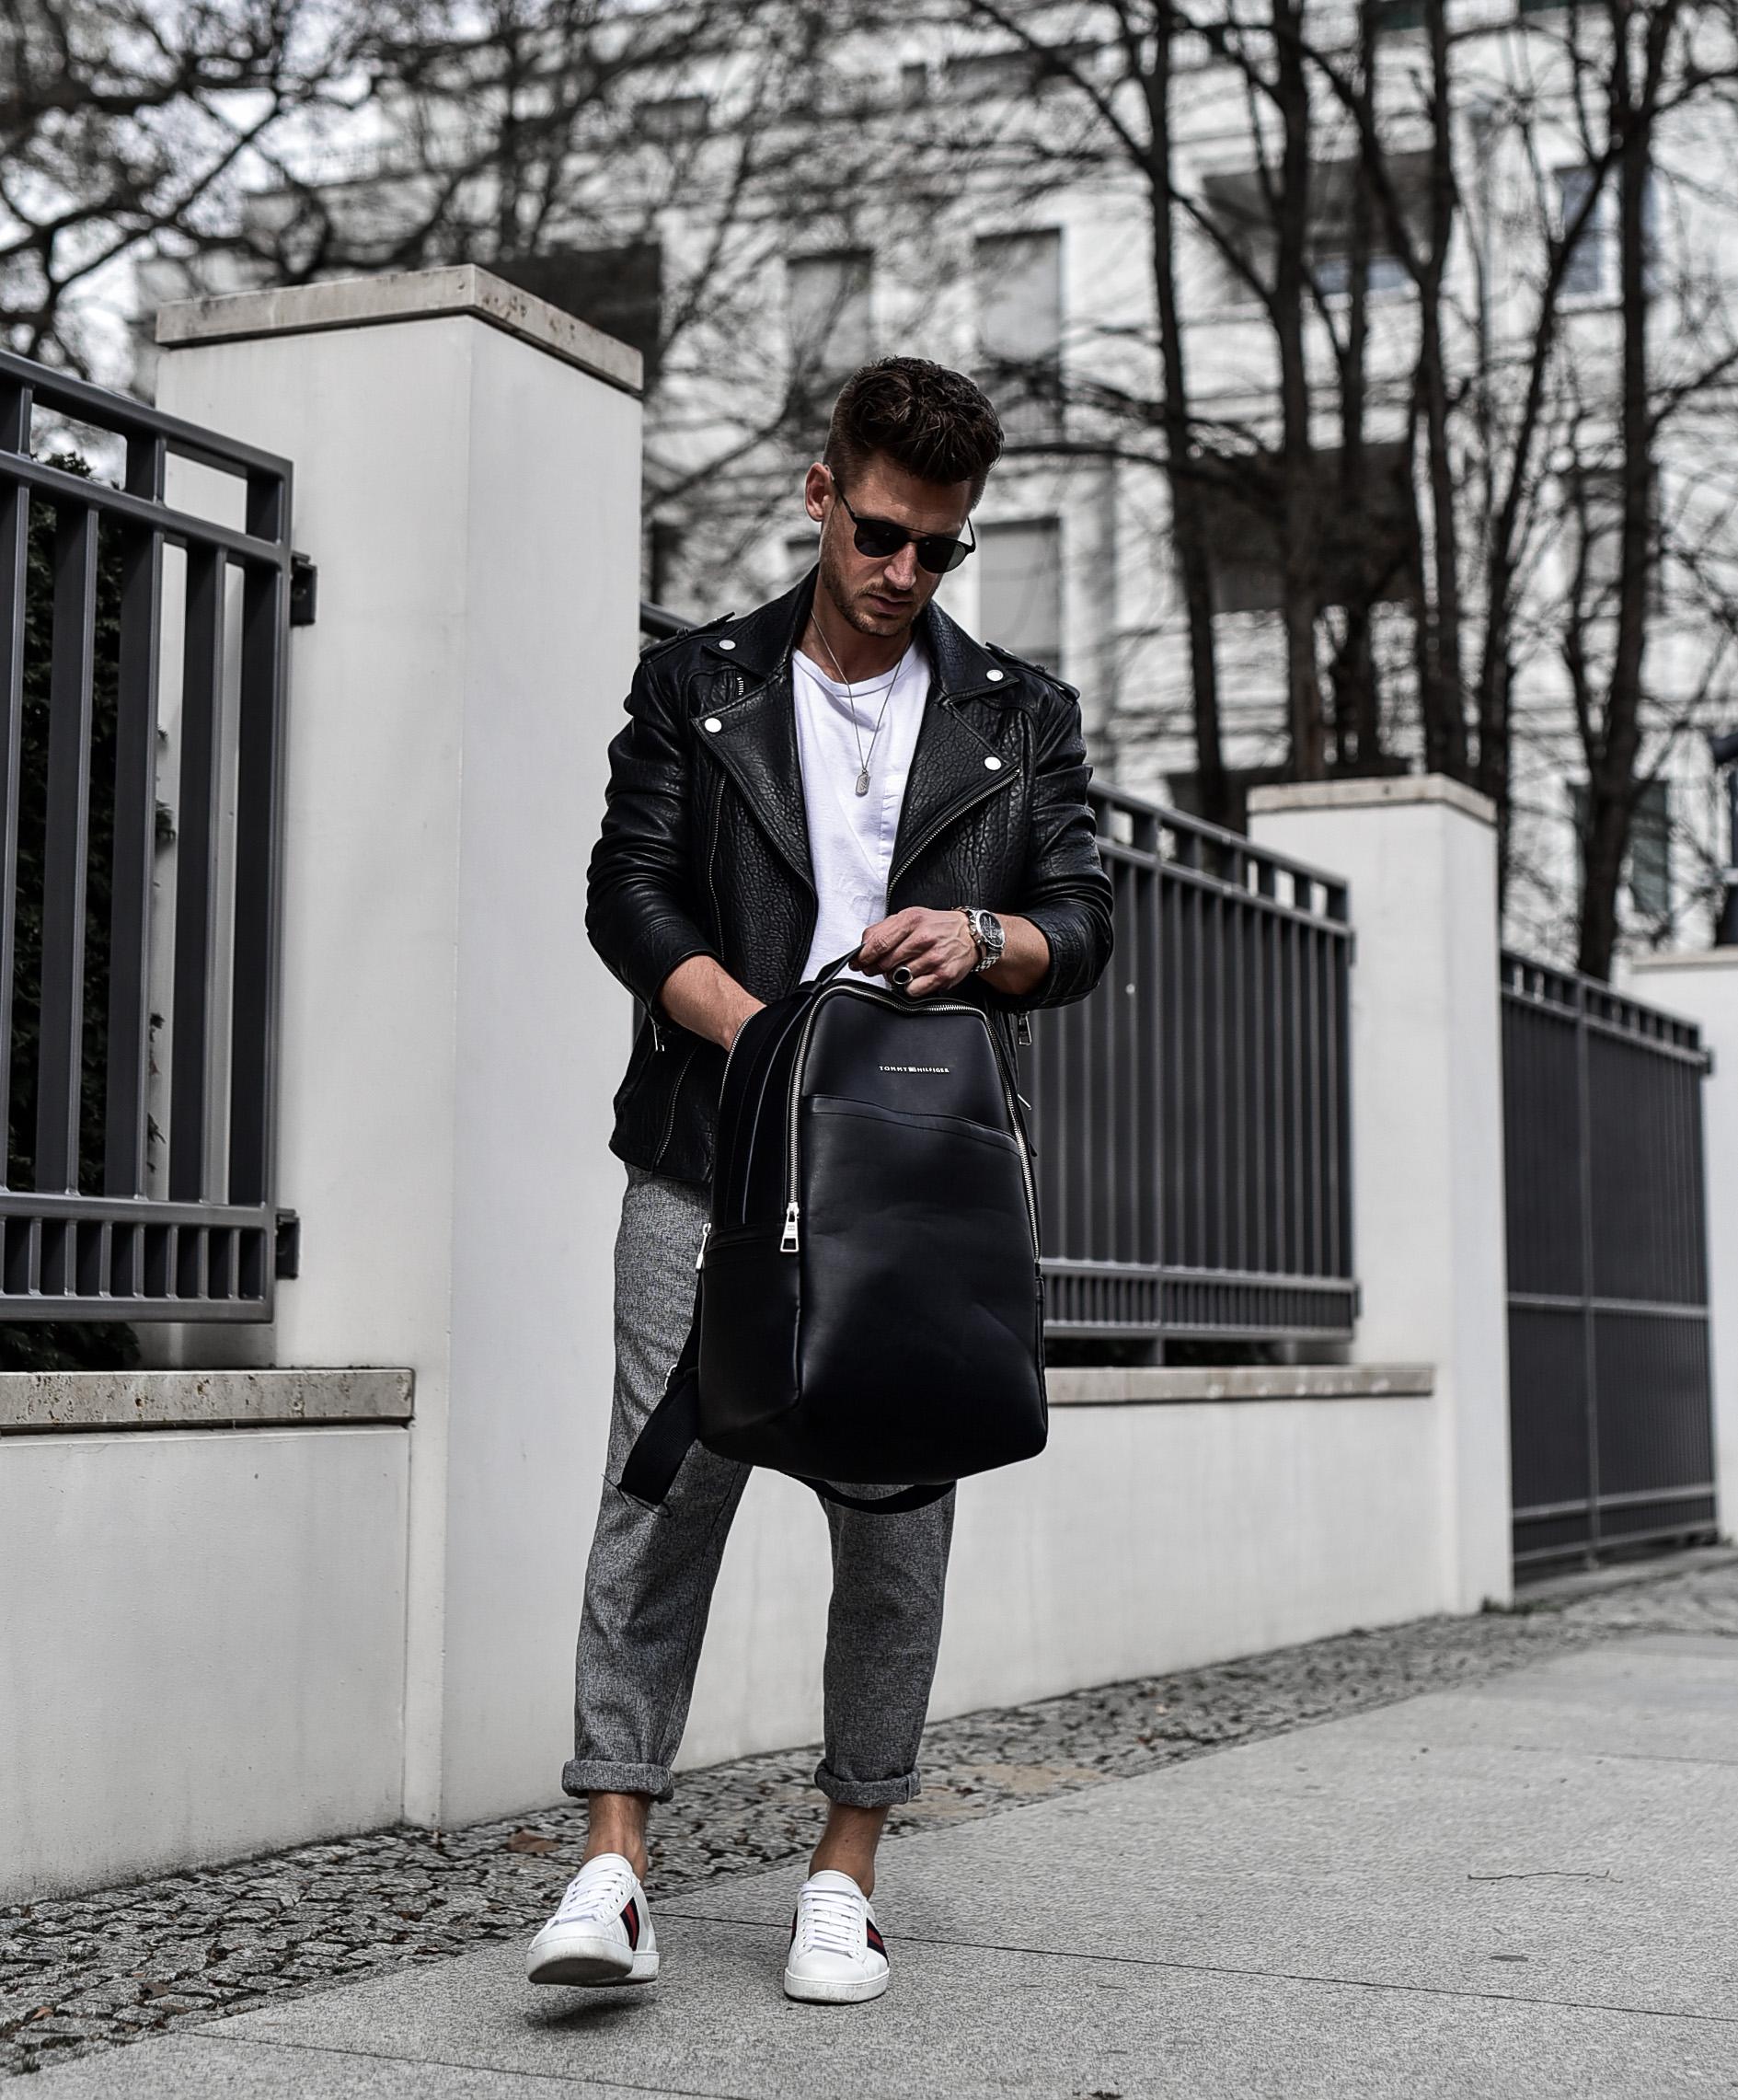 Tommeezjerry-Maennermodeblog-Maennermode-Fashionblog-Styleblog-Berlinblog-Otto-Fashion-Tommy-Hilfiger-Backpack-Rucksack-Calvin-Klein-Lederjacke-Gucci-Sneaker